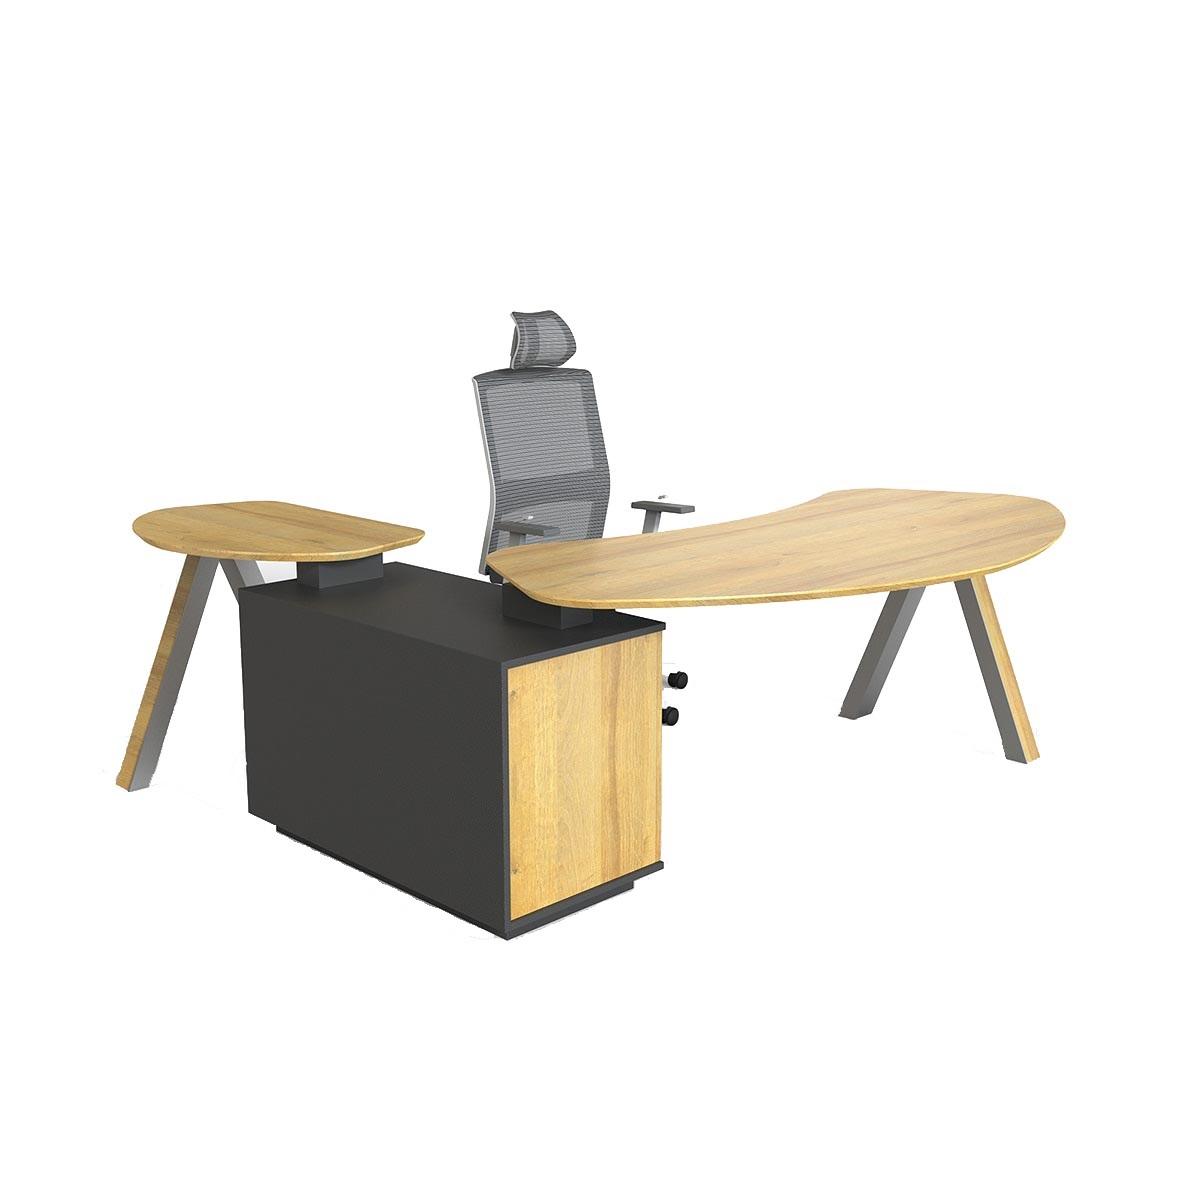 Viva2.2米实木办公桌 - 如何装饰自己的办公桌?